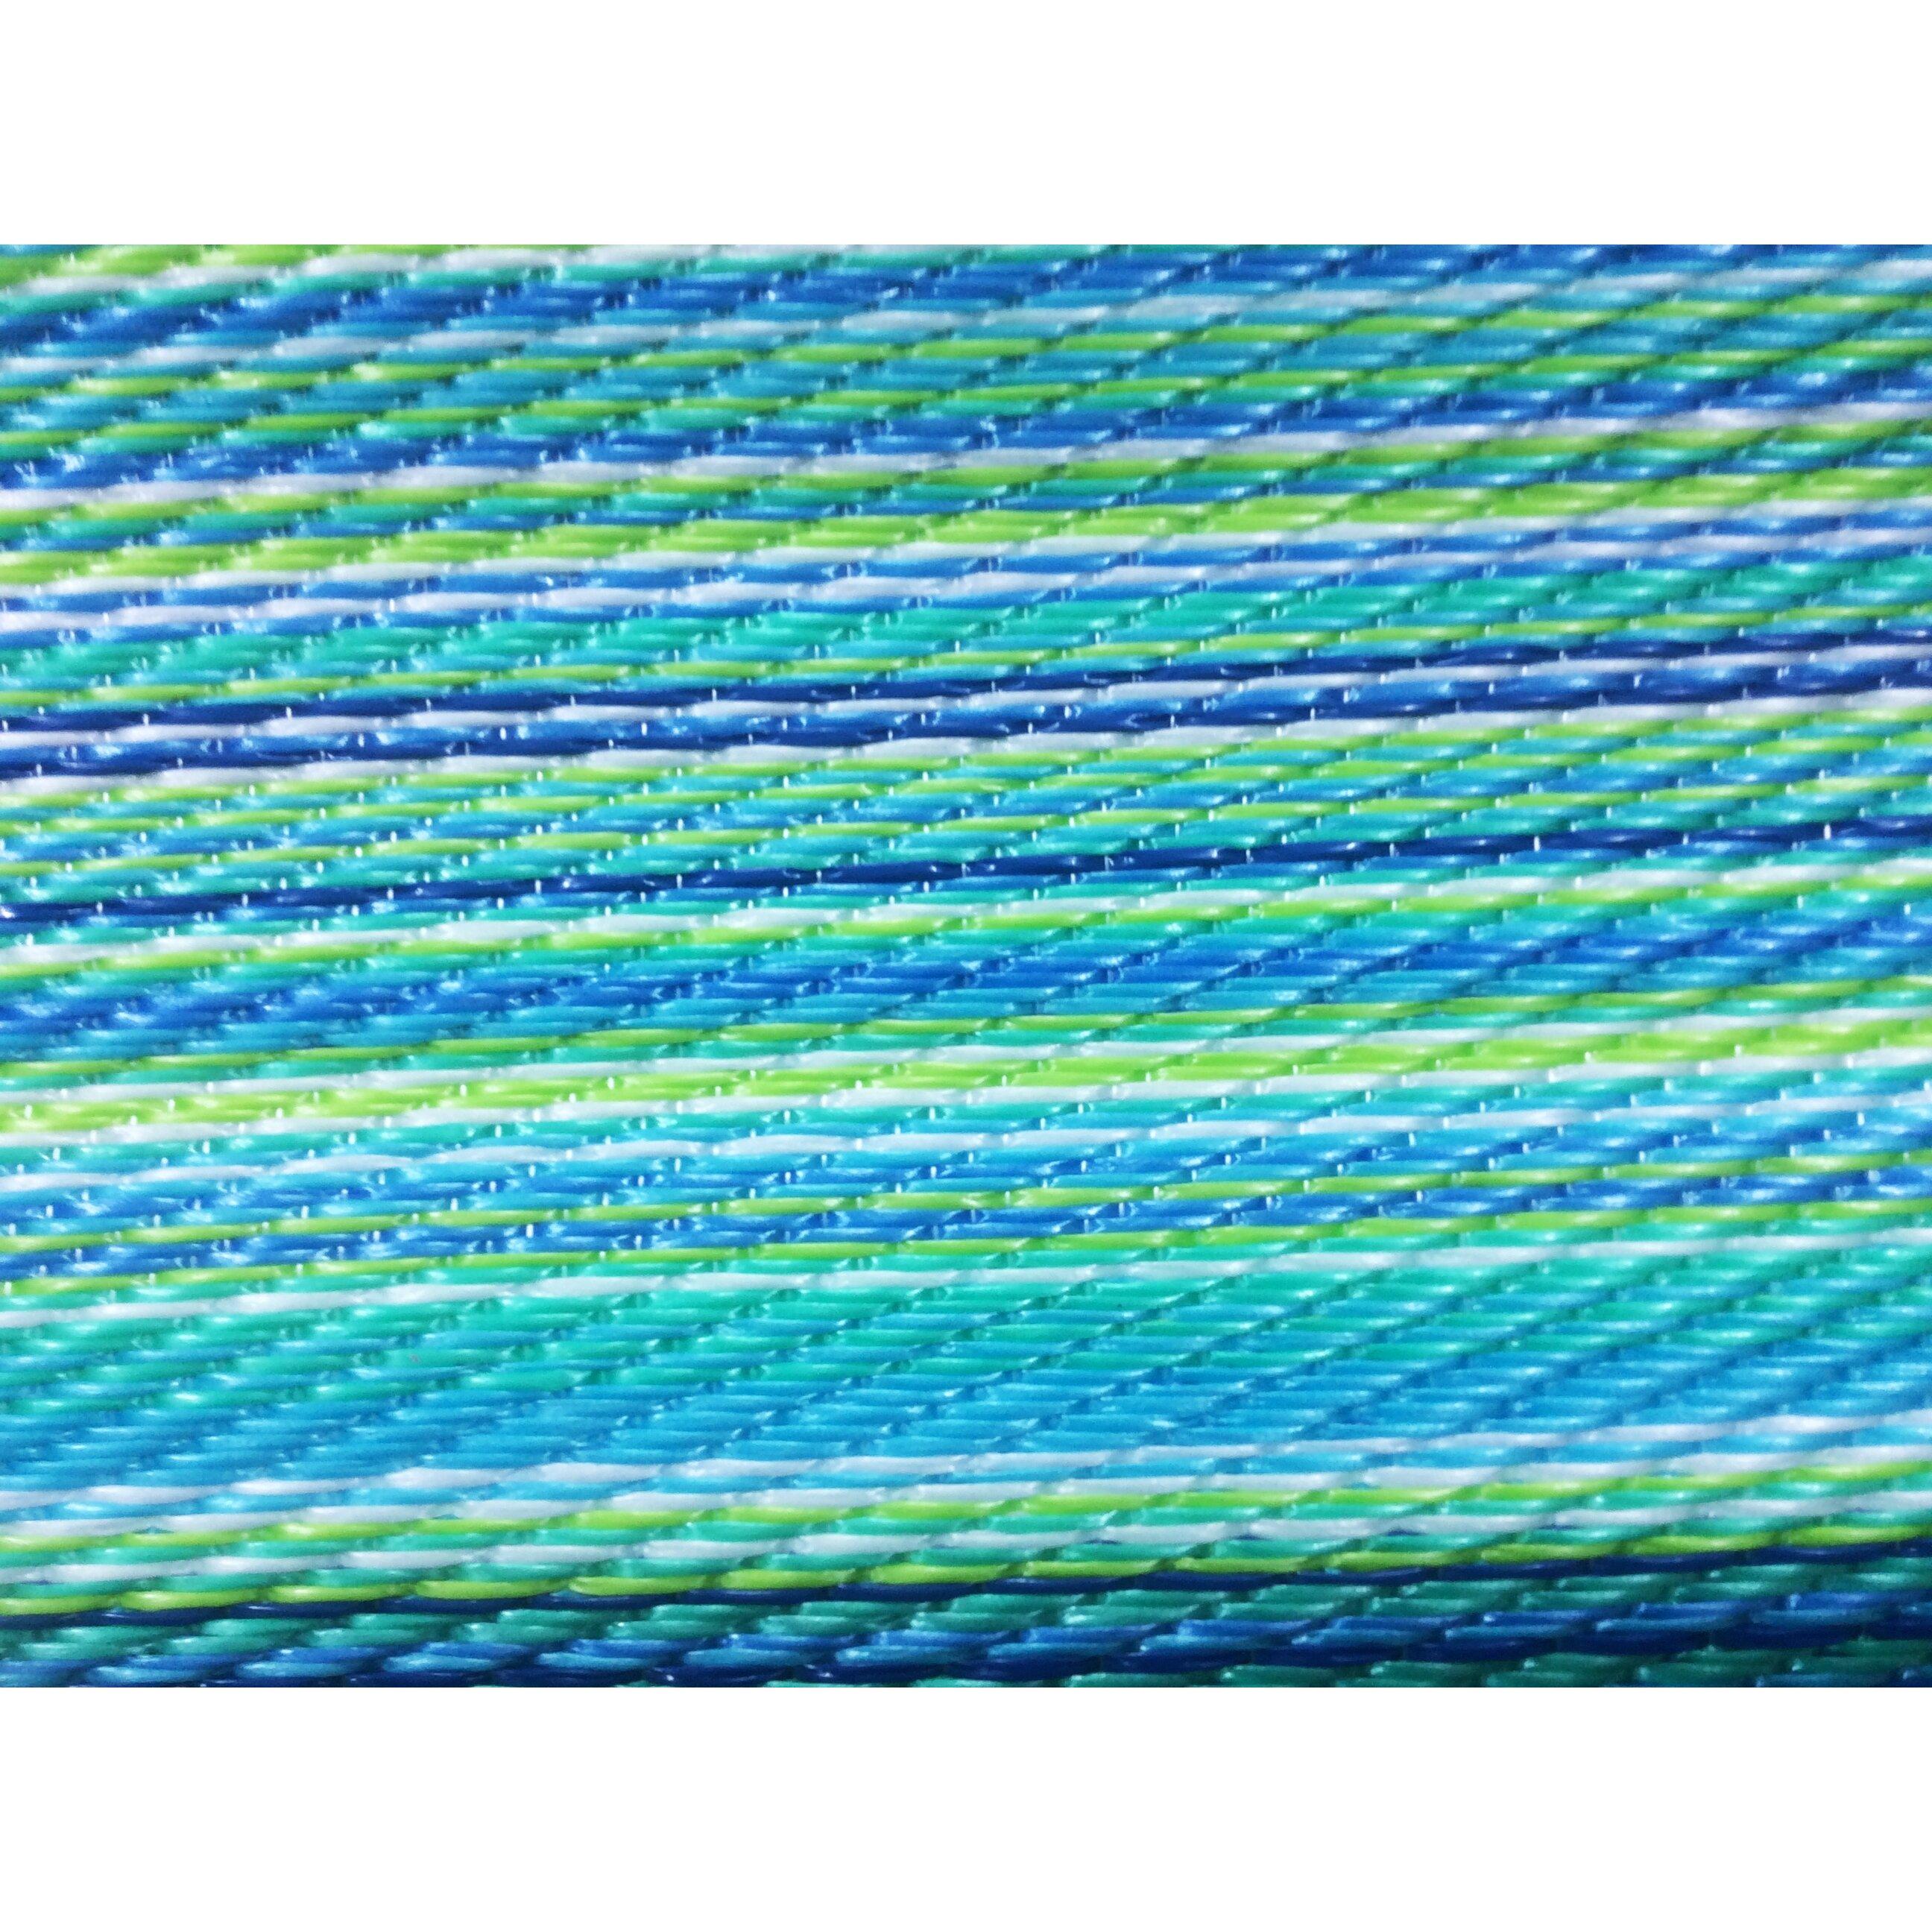 Green Decore Blue Green Indoor Outdoor Area Rug & Reviews